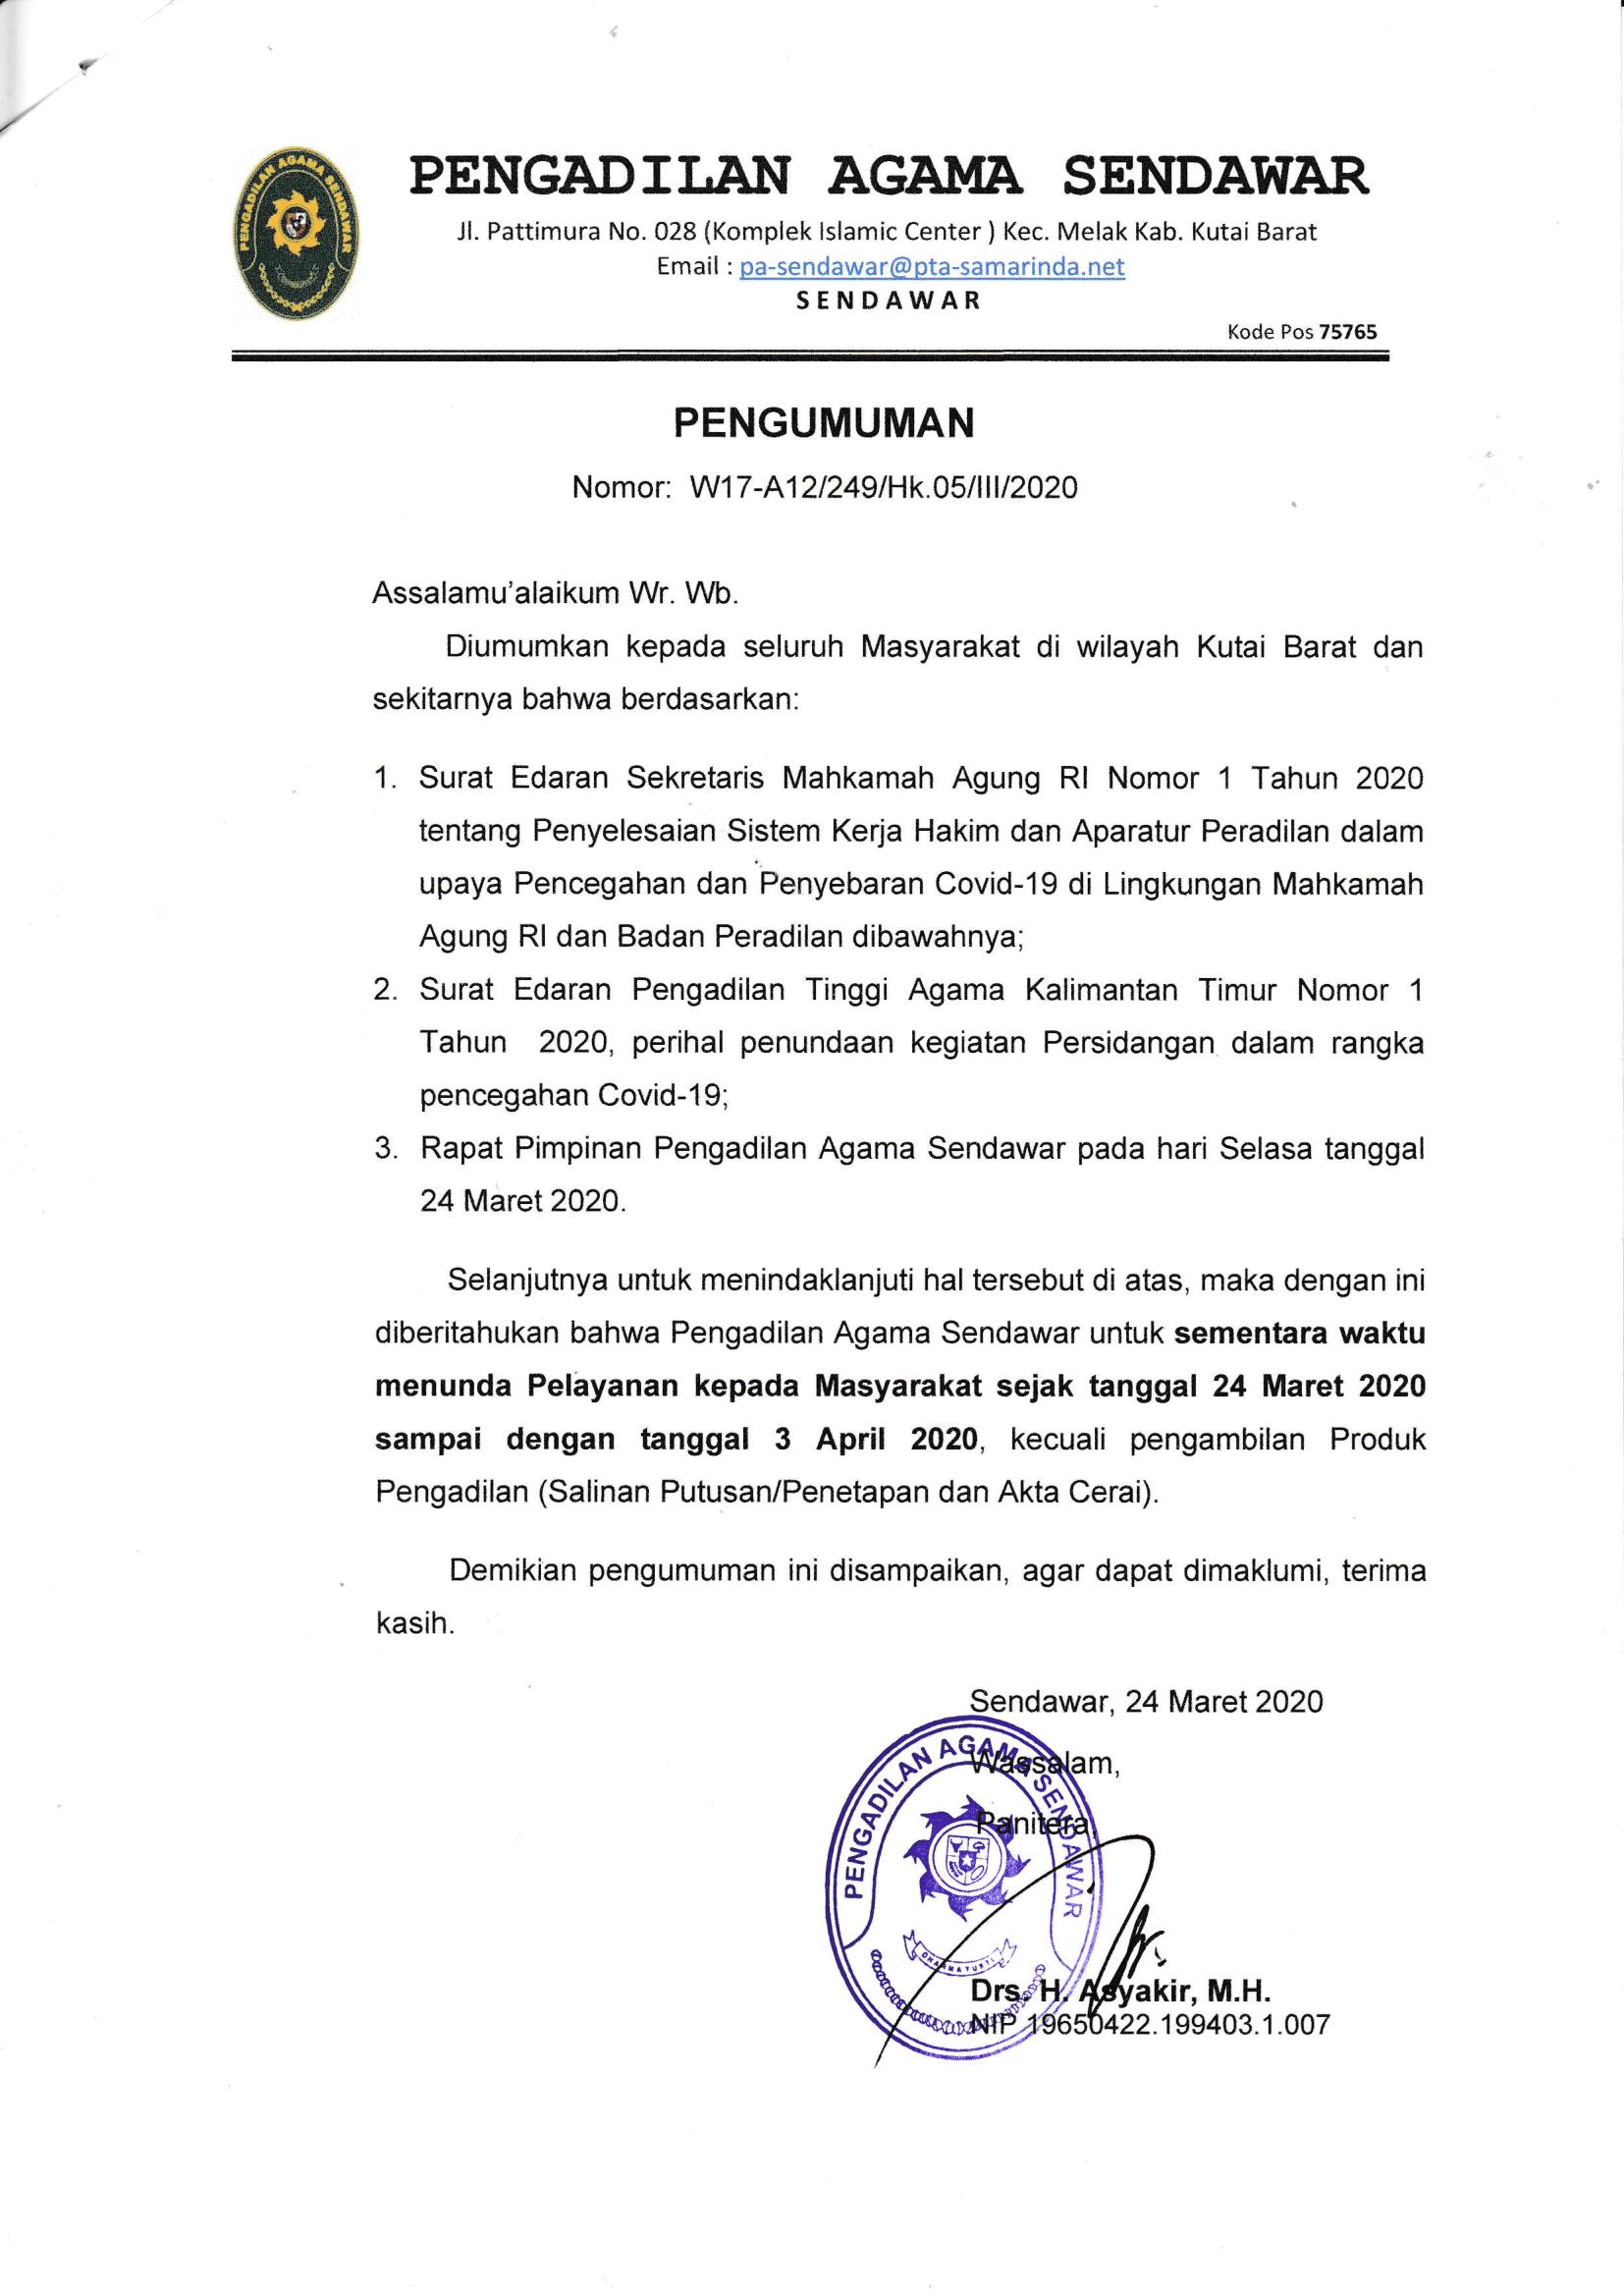 PENGUMUMAN Pencegahan & Penyebaran Covid-19.